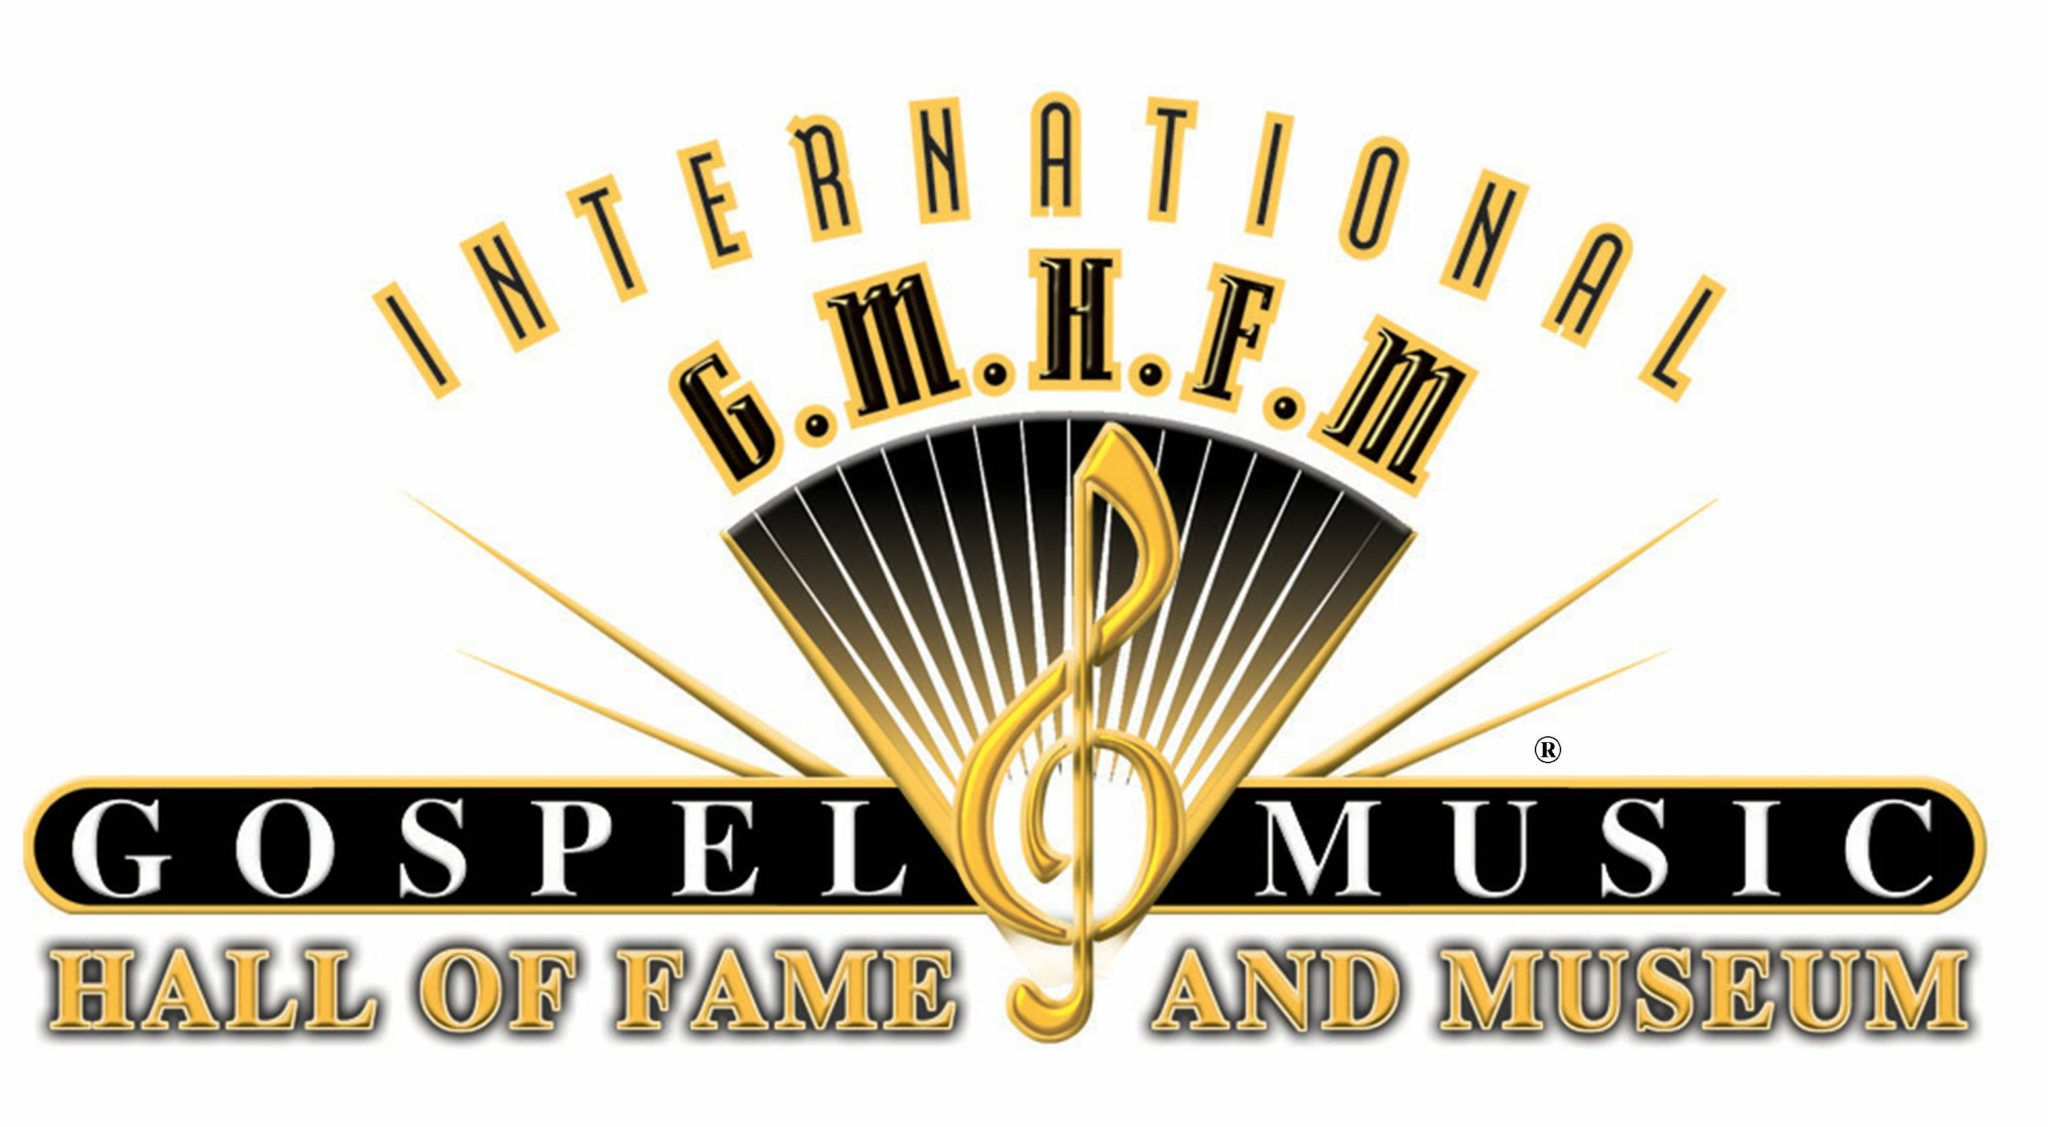 Hall of Fame | Gospel Music Association